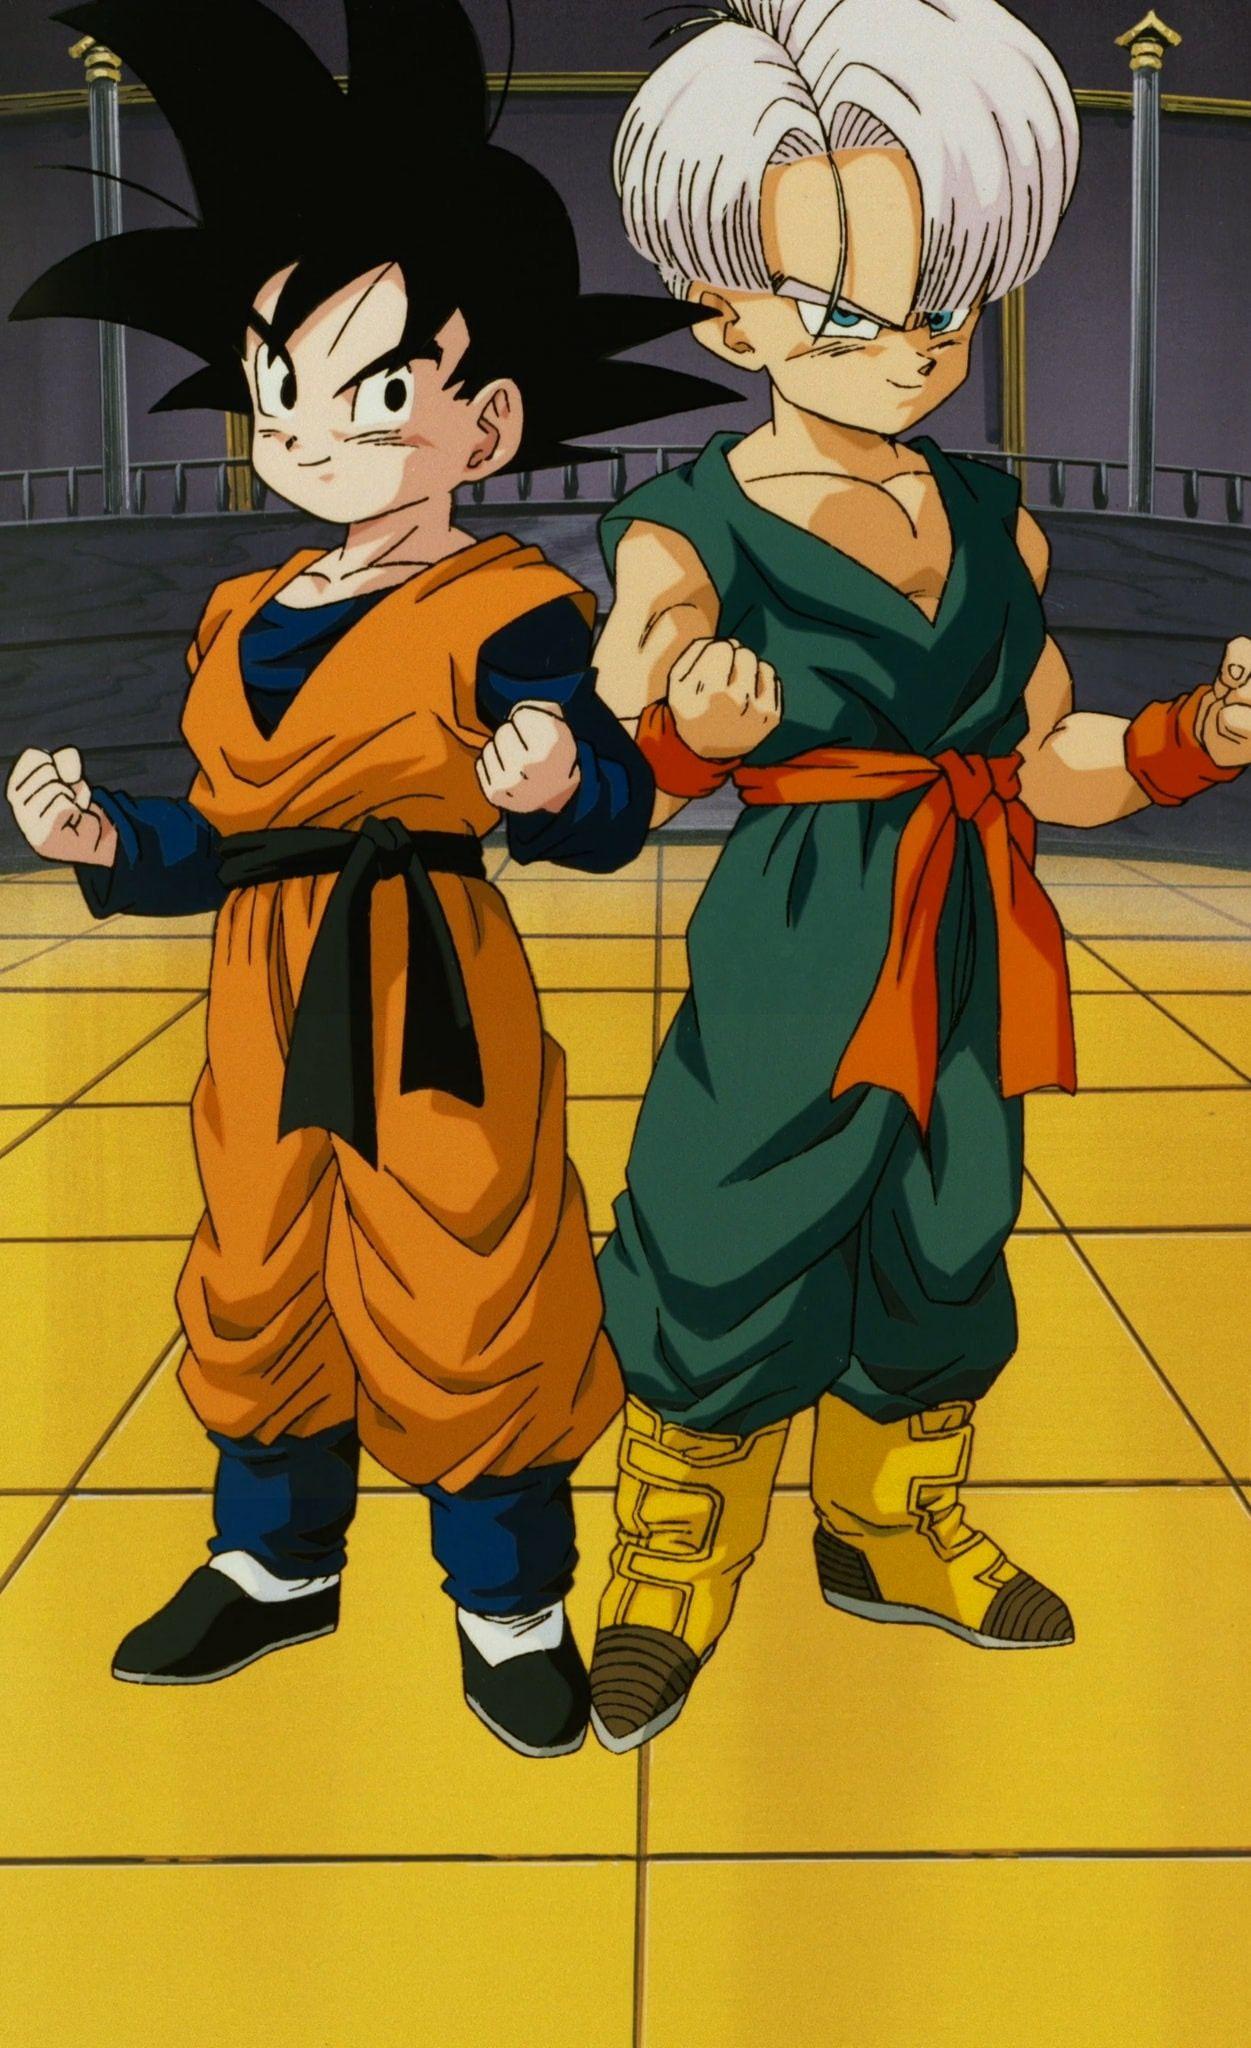 Goten Trunks Broly Vintage Dragon Ball Z Movie Manga Dragon Ball Anime Goten E Trunks